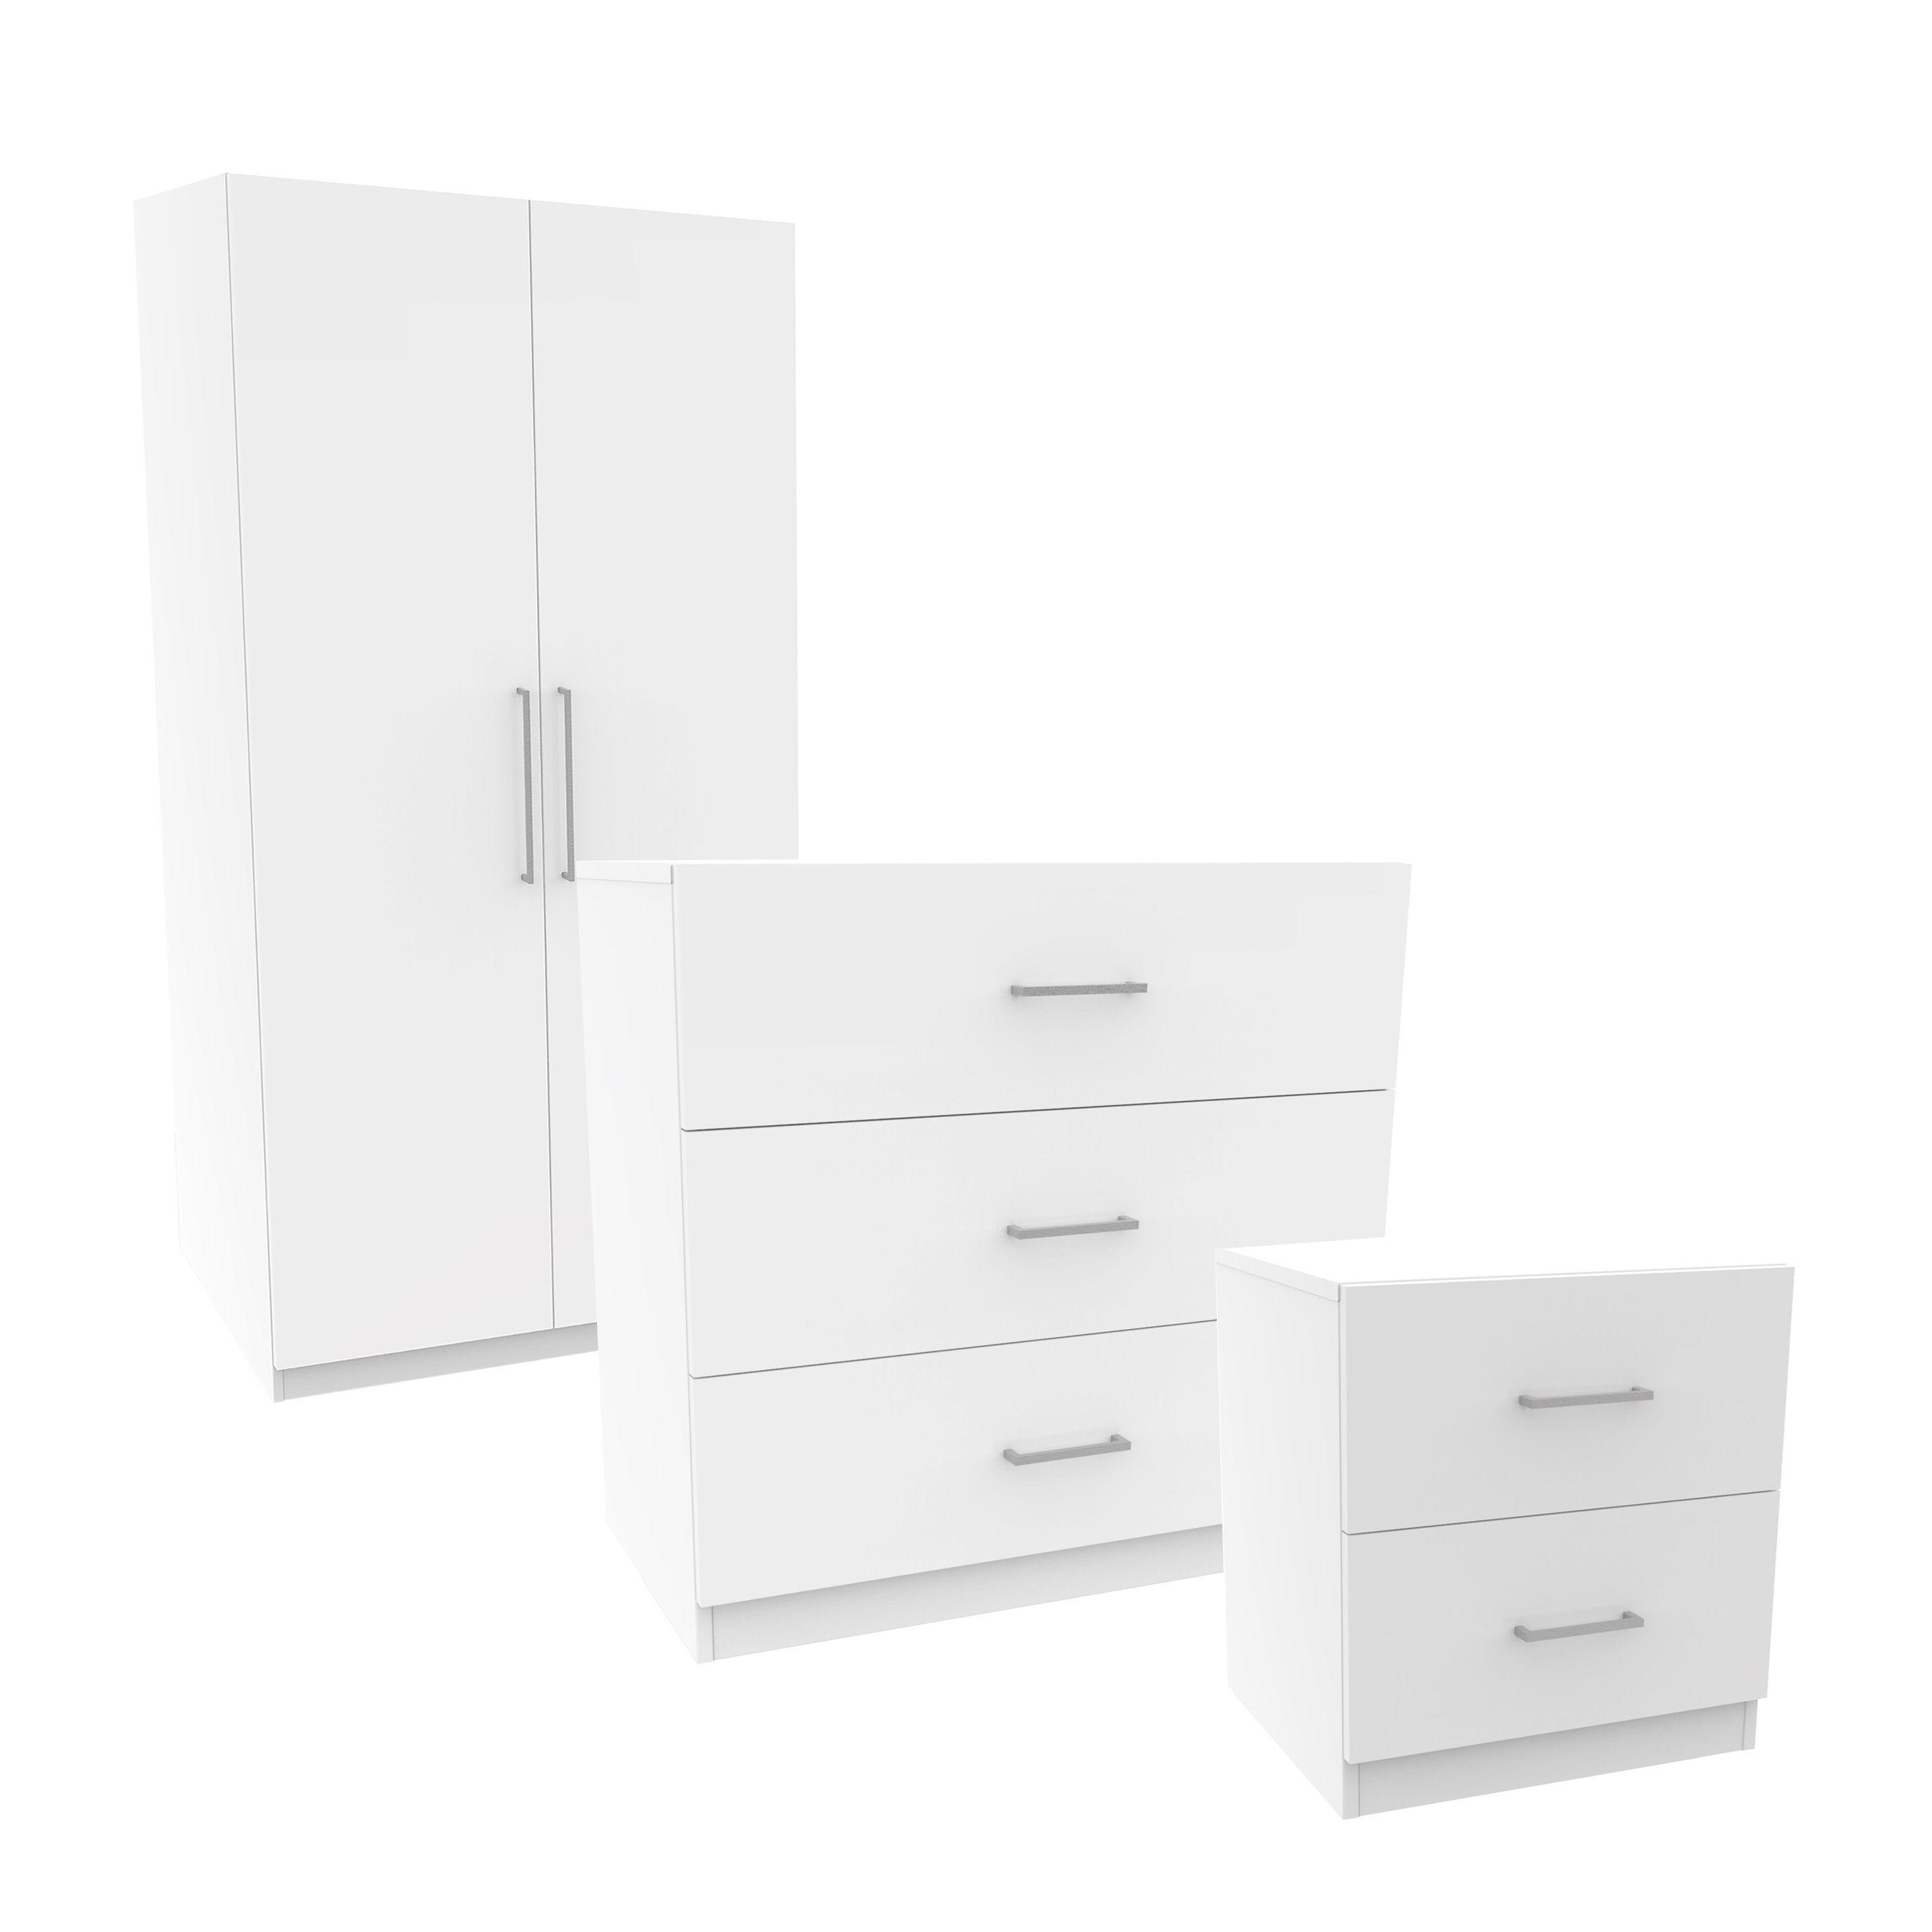 blanc pure fond set unit for drawers white drawer storage